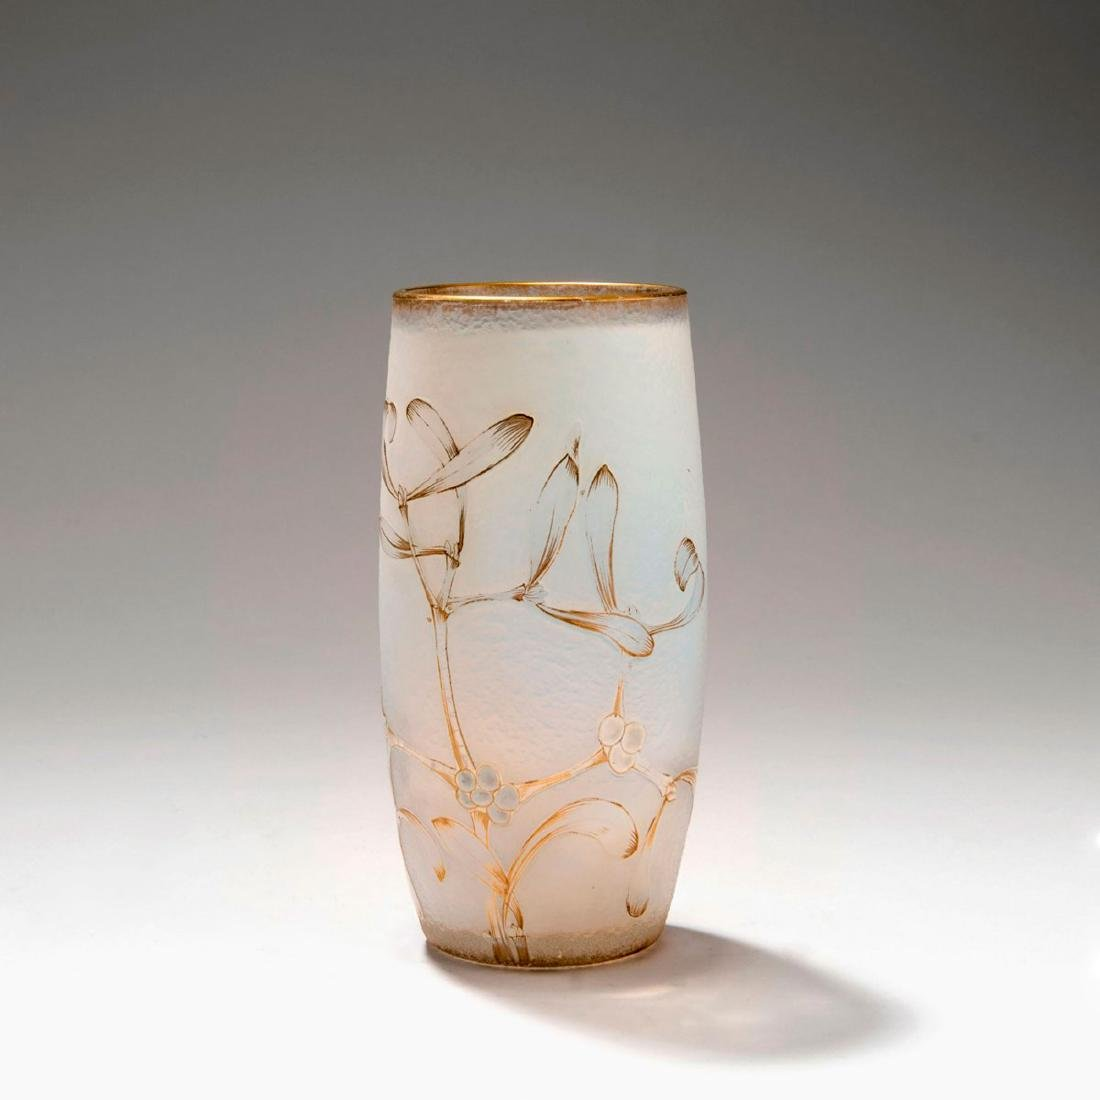 Small 'Gui' vase, 1895